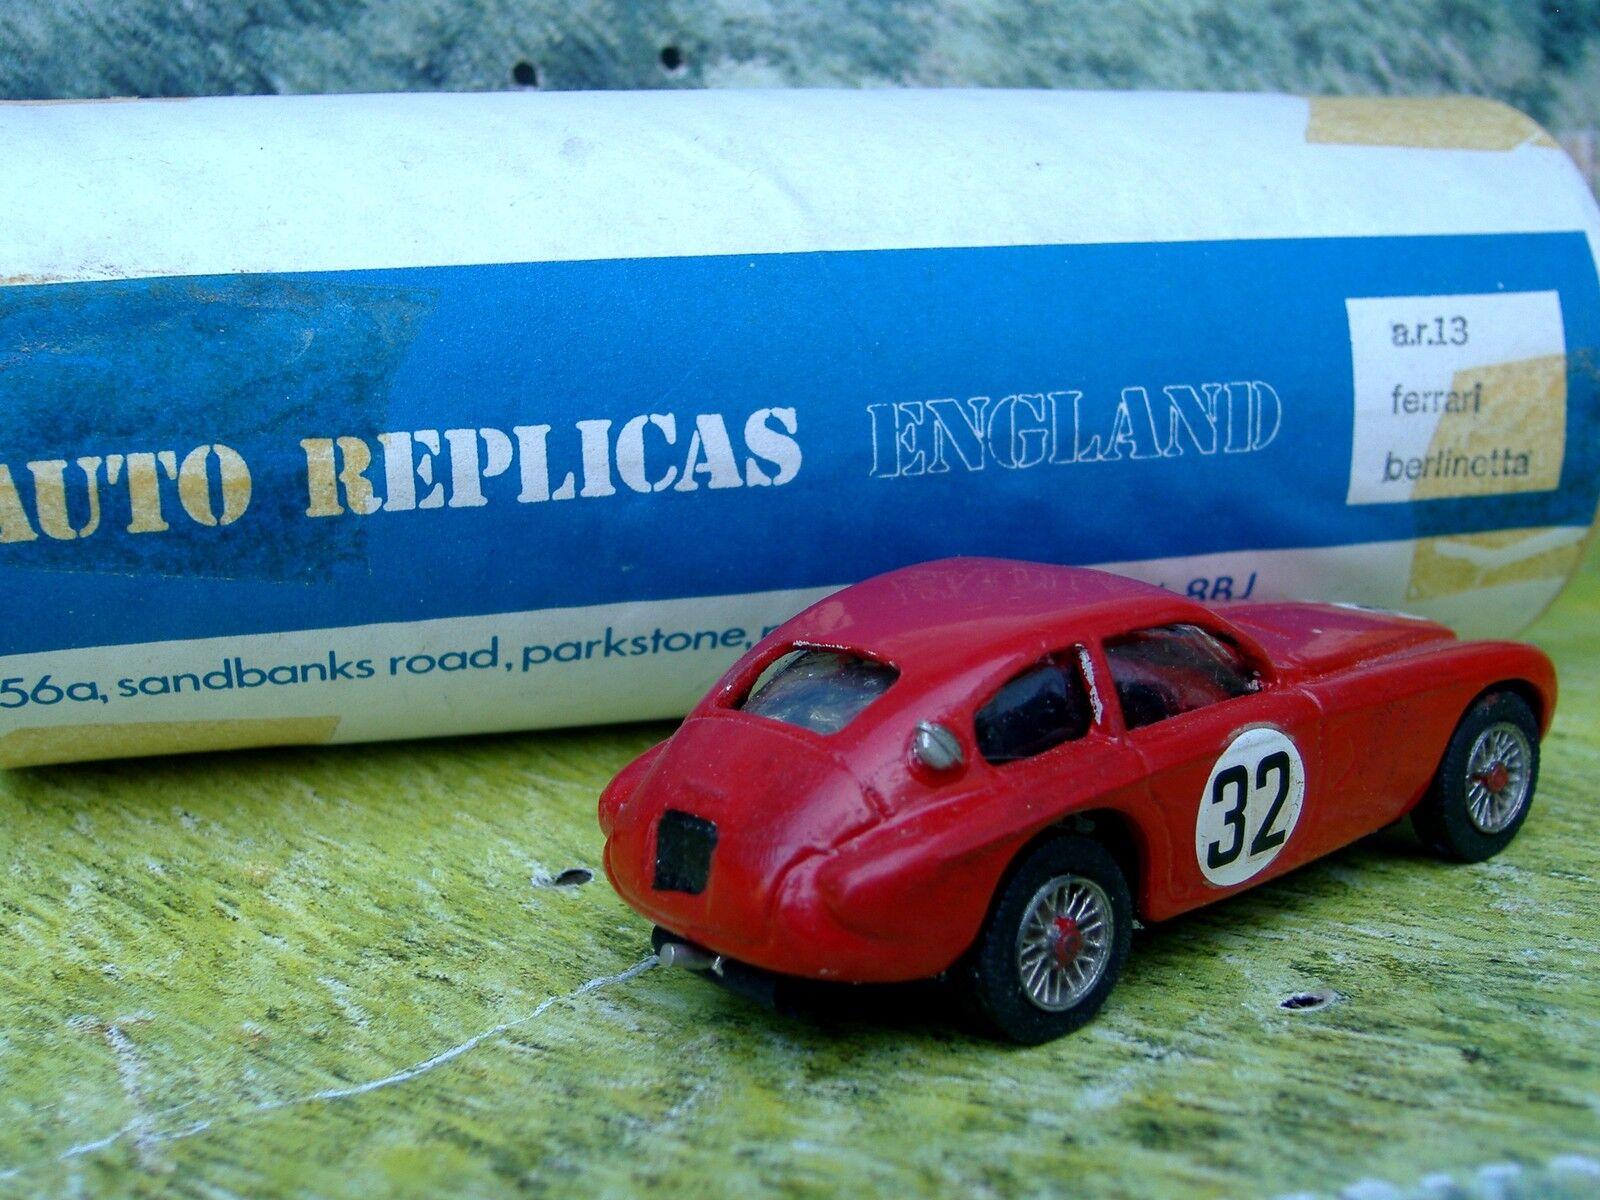 1 43 43 43 AUTO REPLICAS(England) Ferrari berlinett Handmade White Metal Model Car Kit ce5166